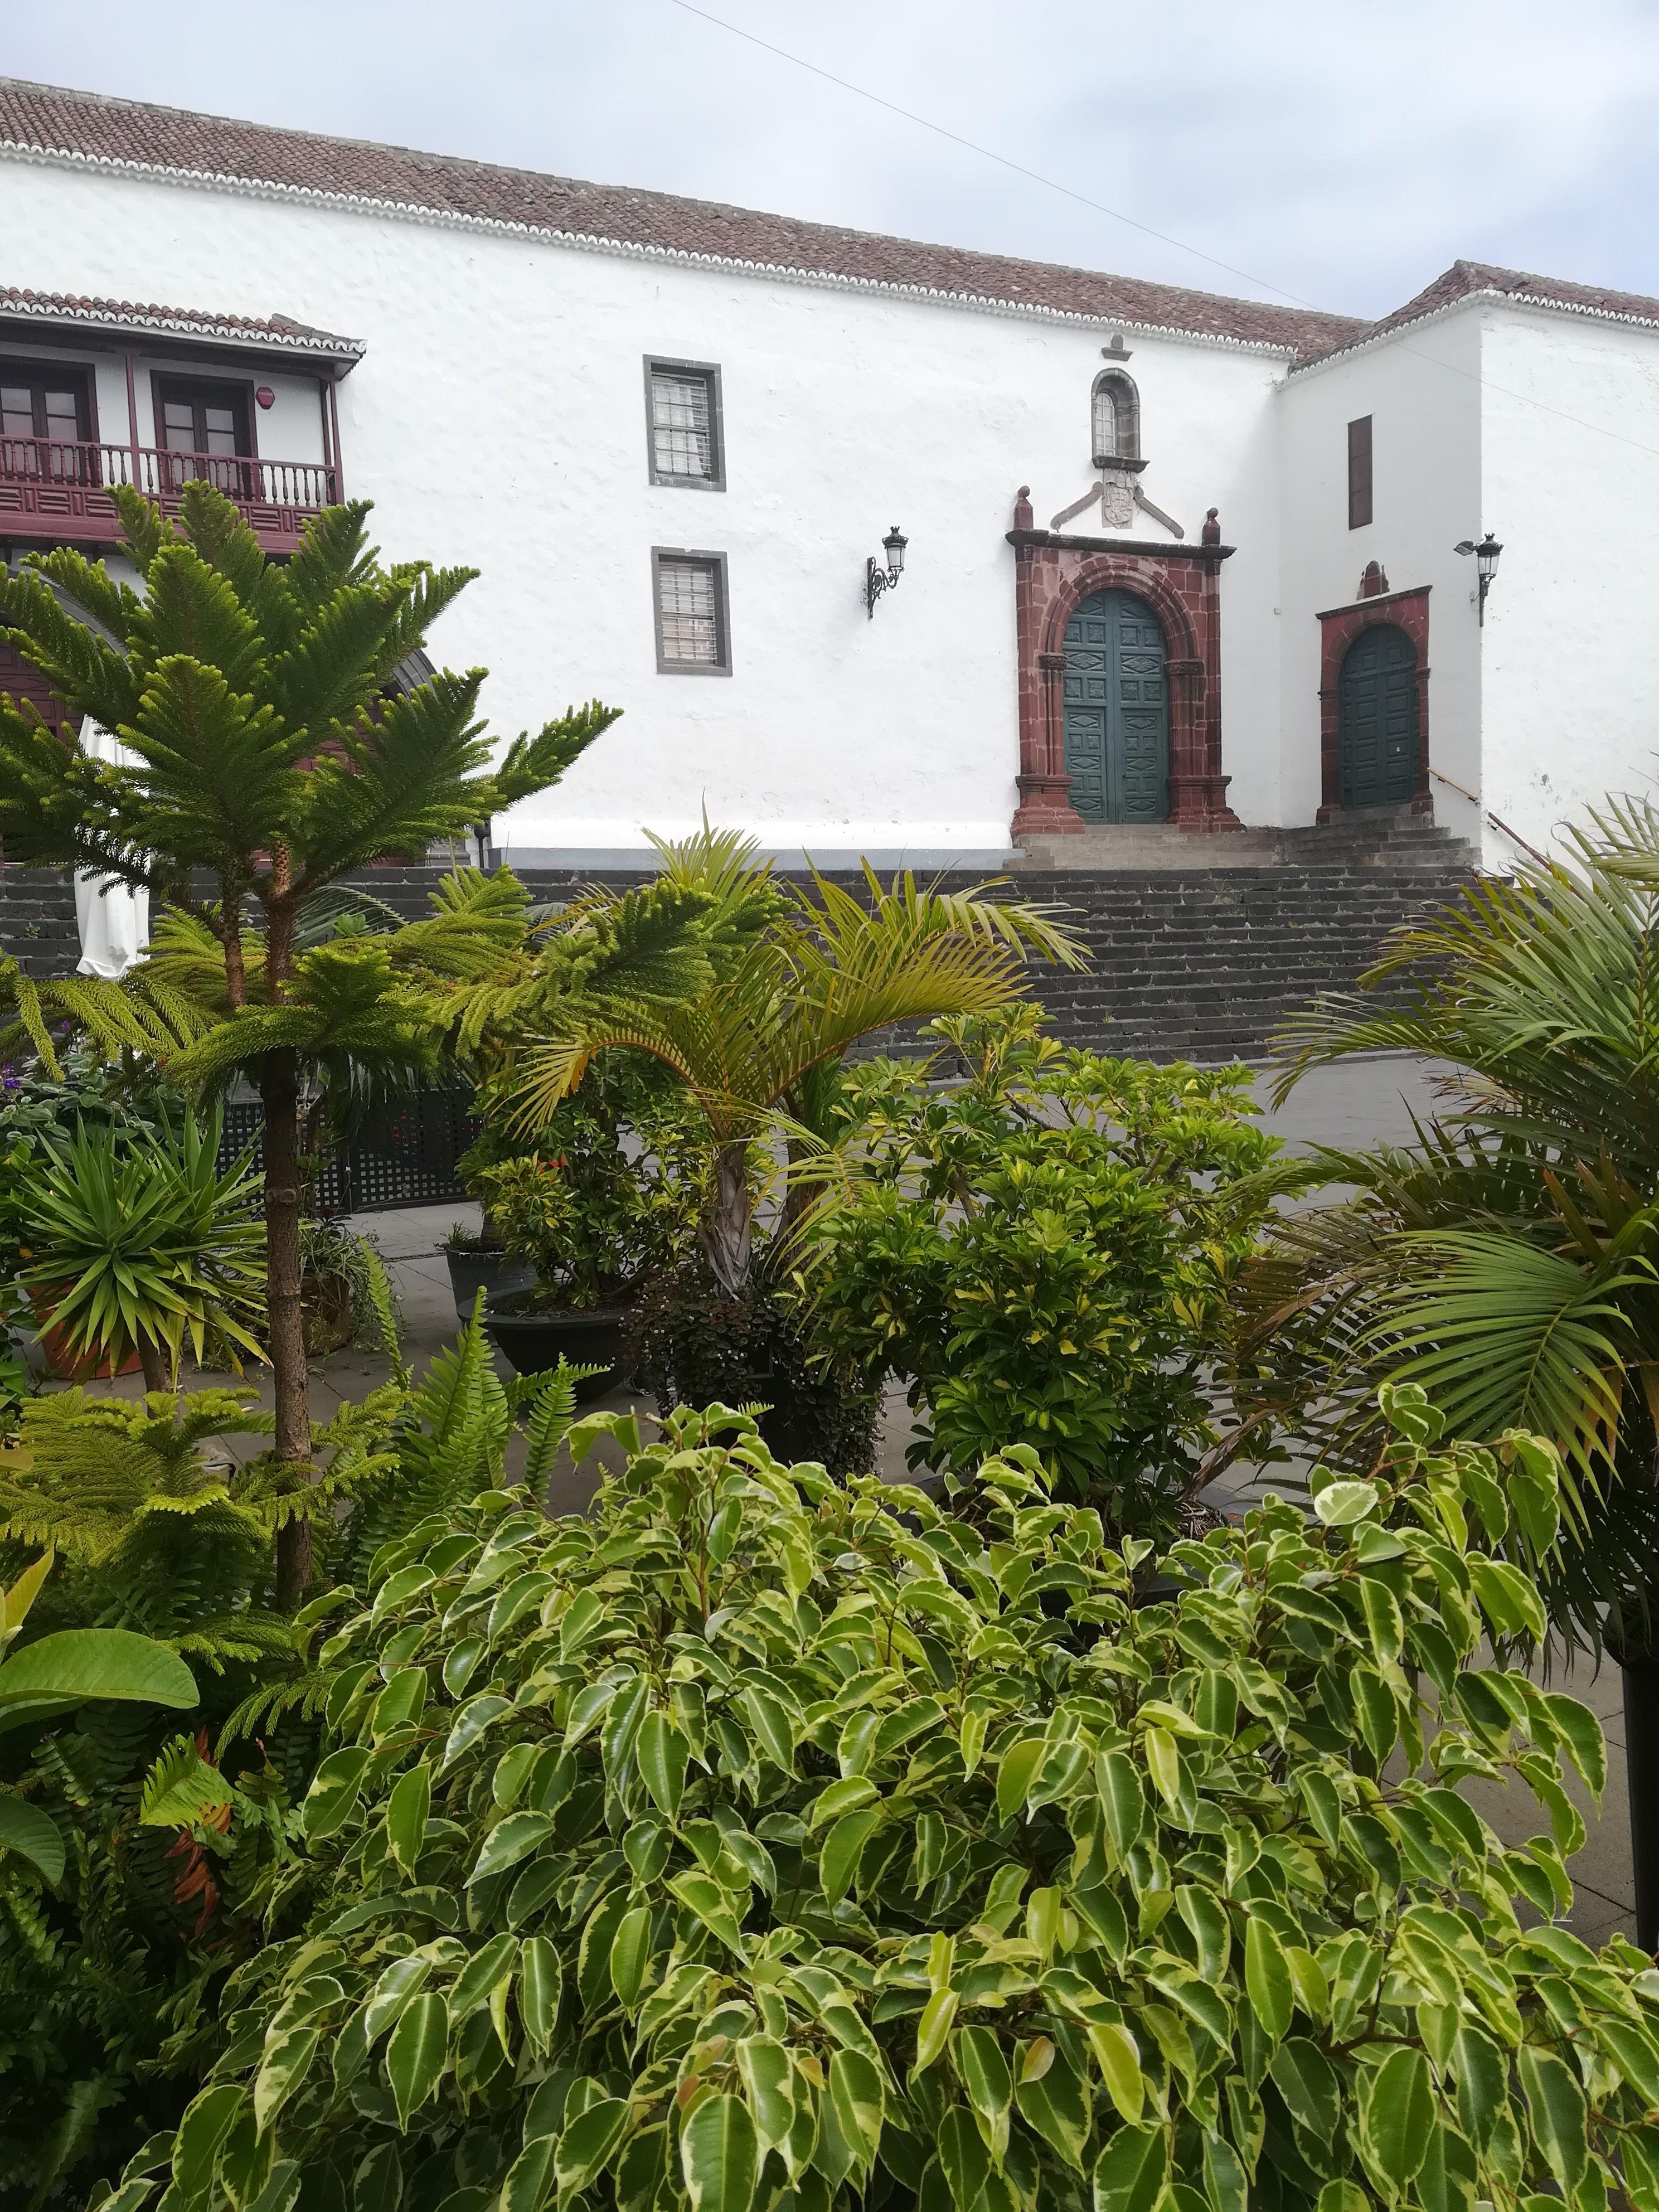 Canarian cuisine in Santa Cruz de La Palma